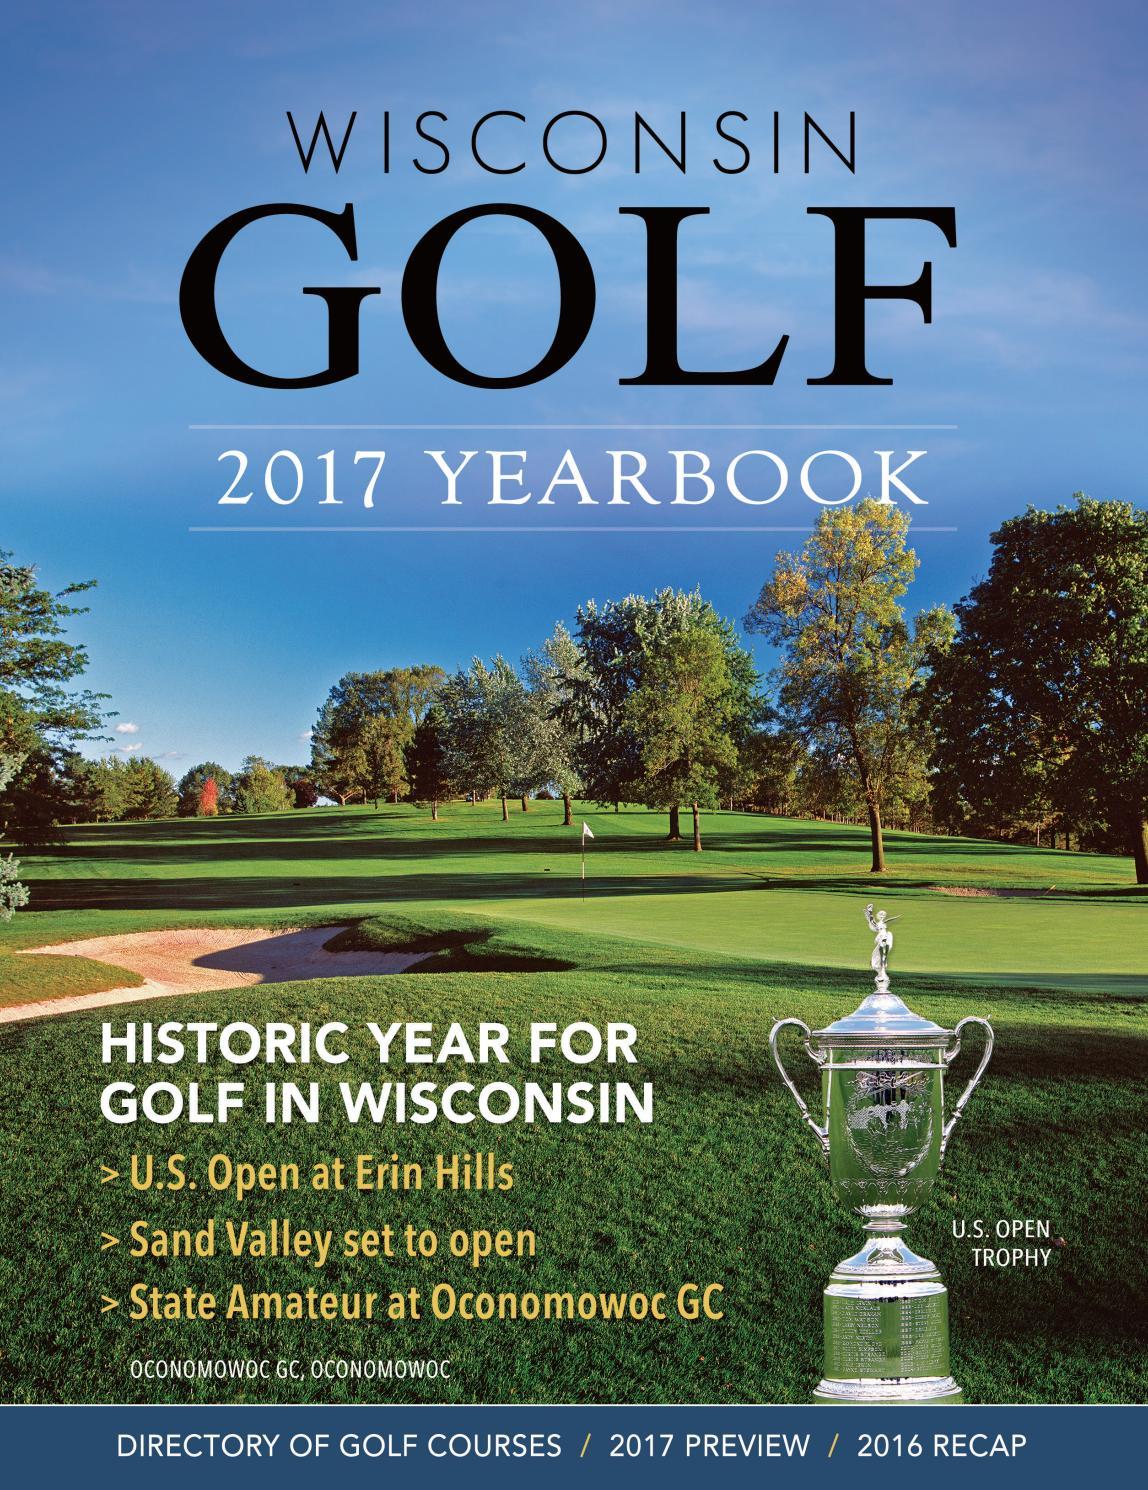 2017 Wisconsin Golf Yearbook by Killarney Golf Media - issuu